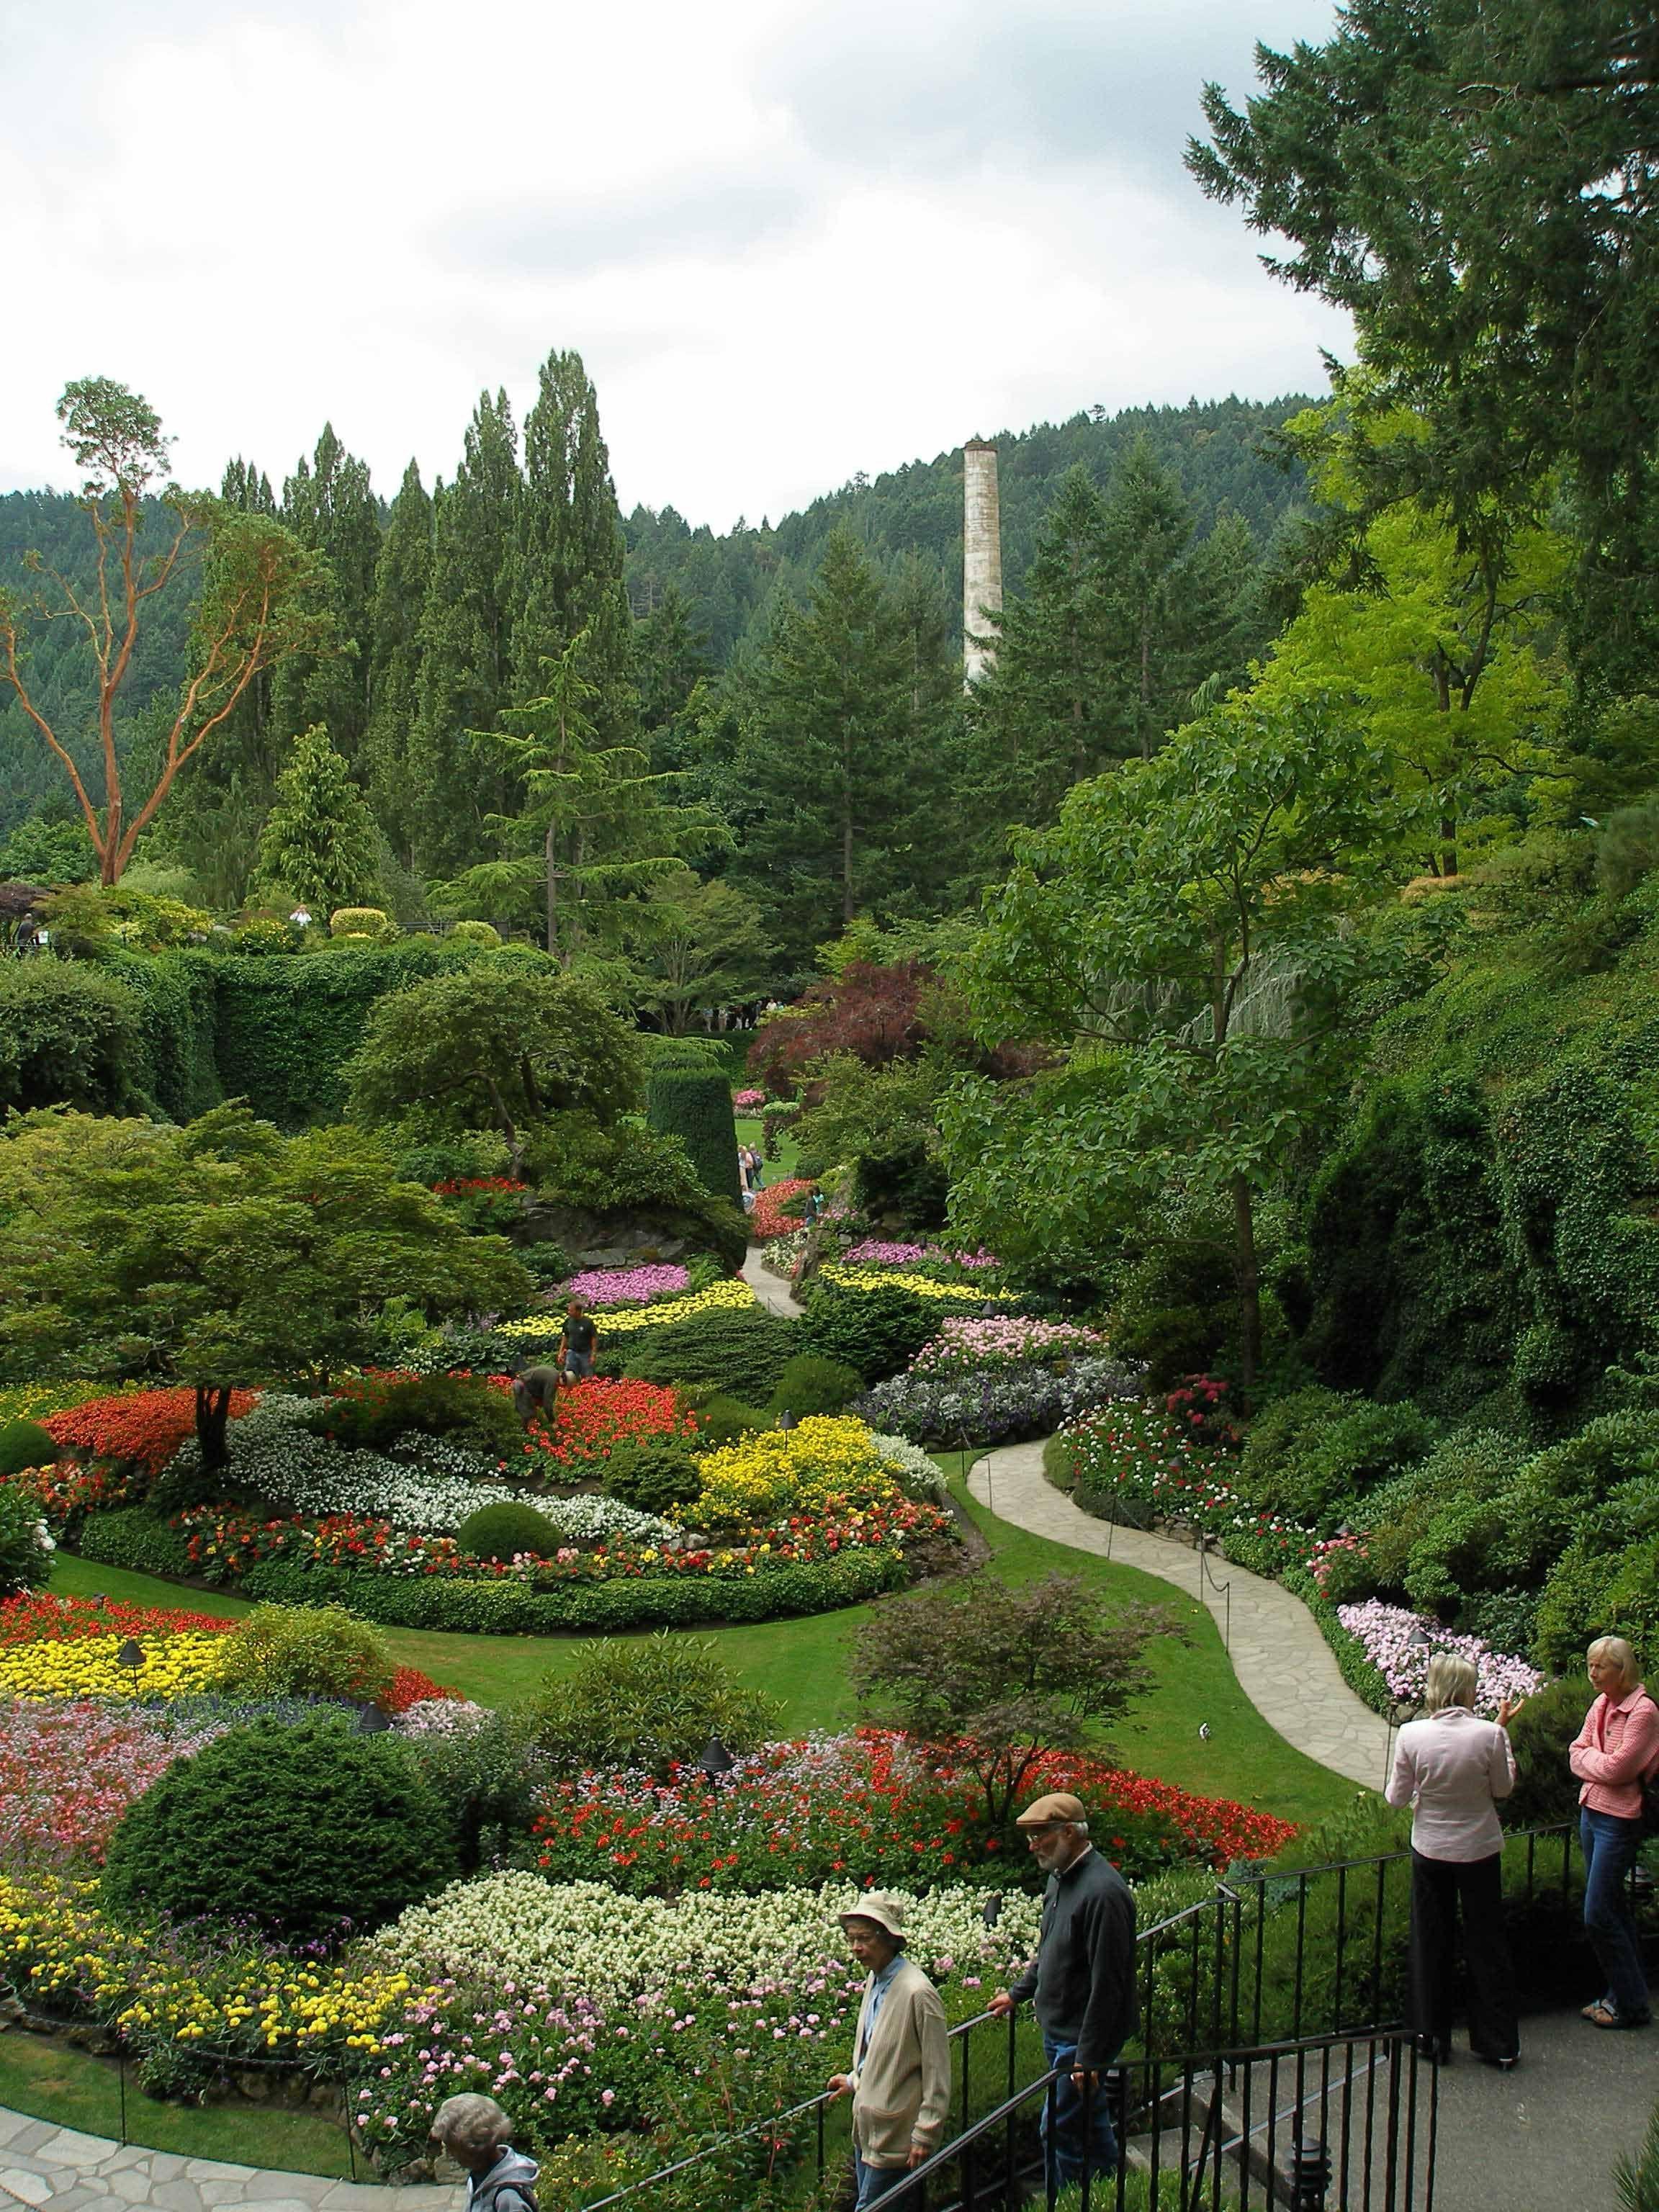 Butchart Gardens butchartgardens Butchart Gardens